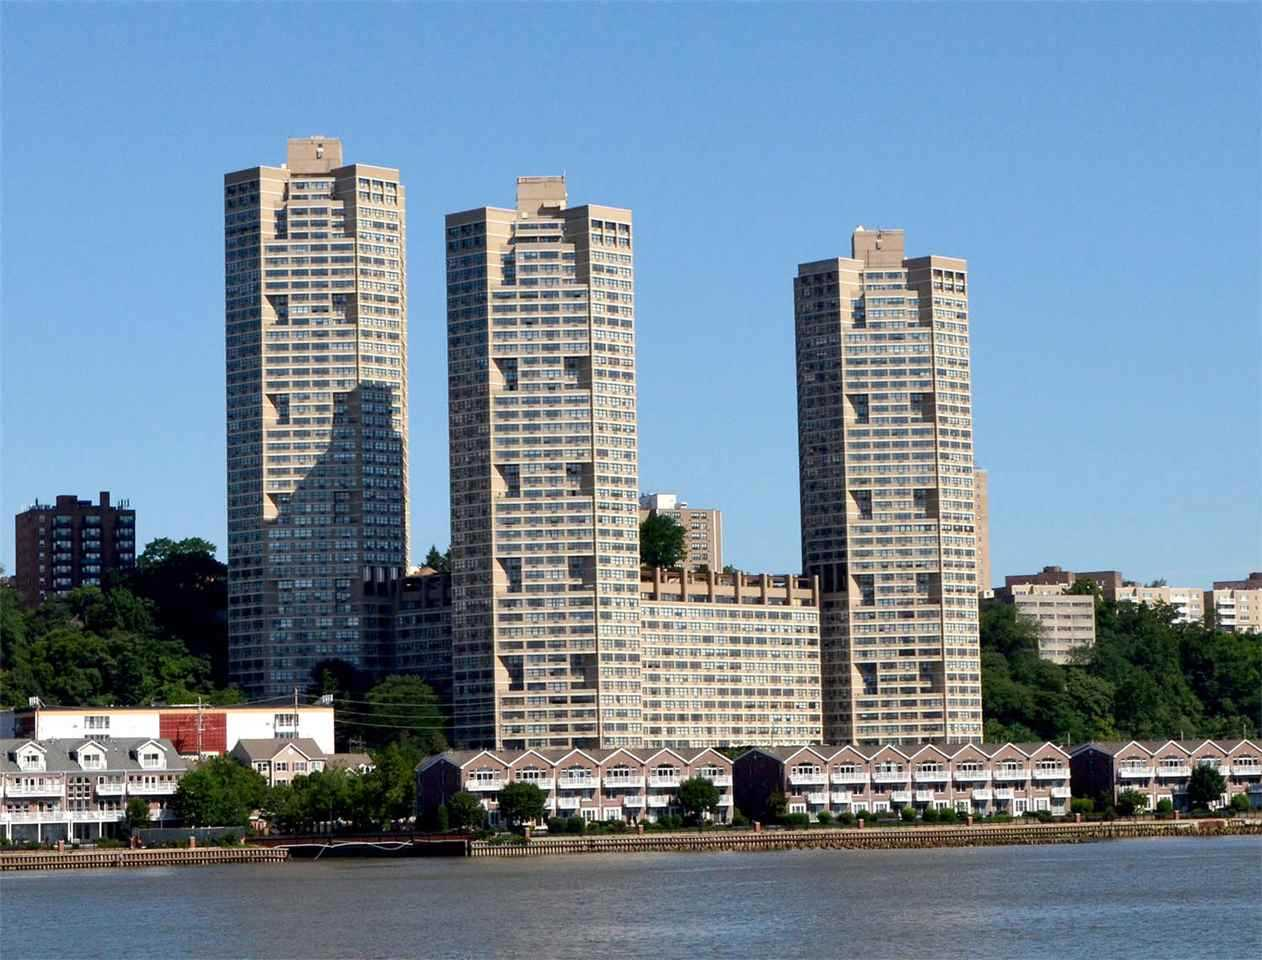 7004 Boulevard #3C Guttenberg, NJ 07093 | MLS 190005017 Photo 1